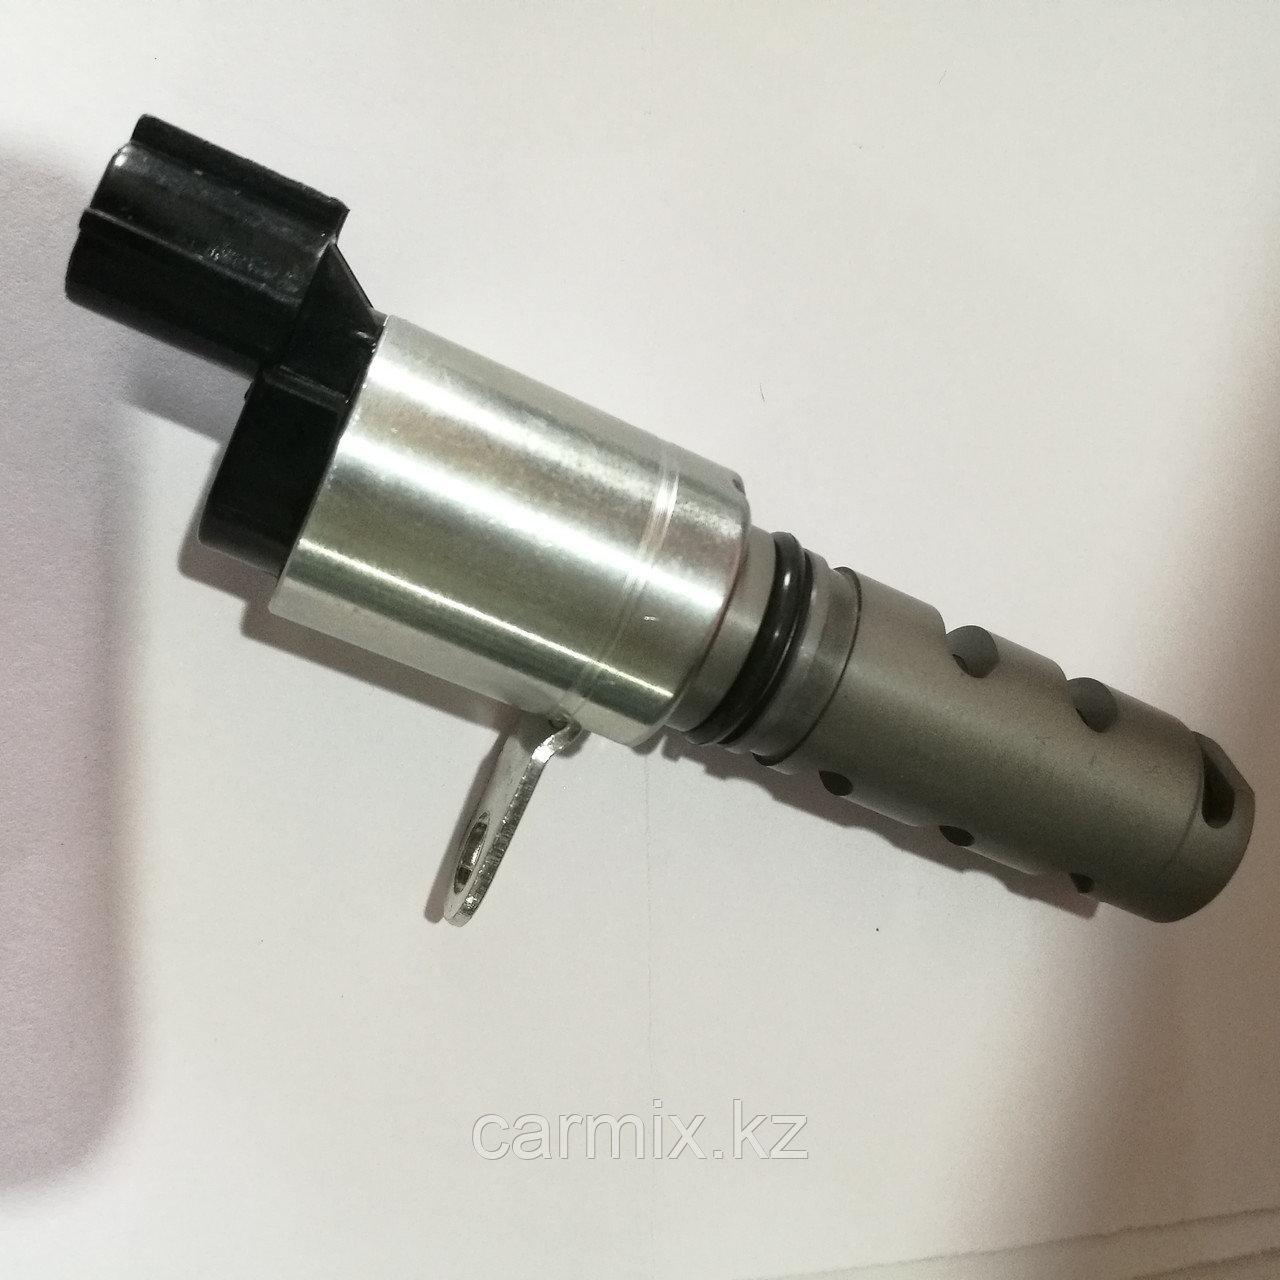 Клапан изменения фаз ГРМ (клапан управления подачей масла) MITSUBISHI ASX GA2W, OUTLANDER CW4W, CW5W, GF2W